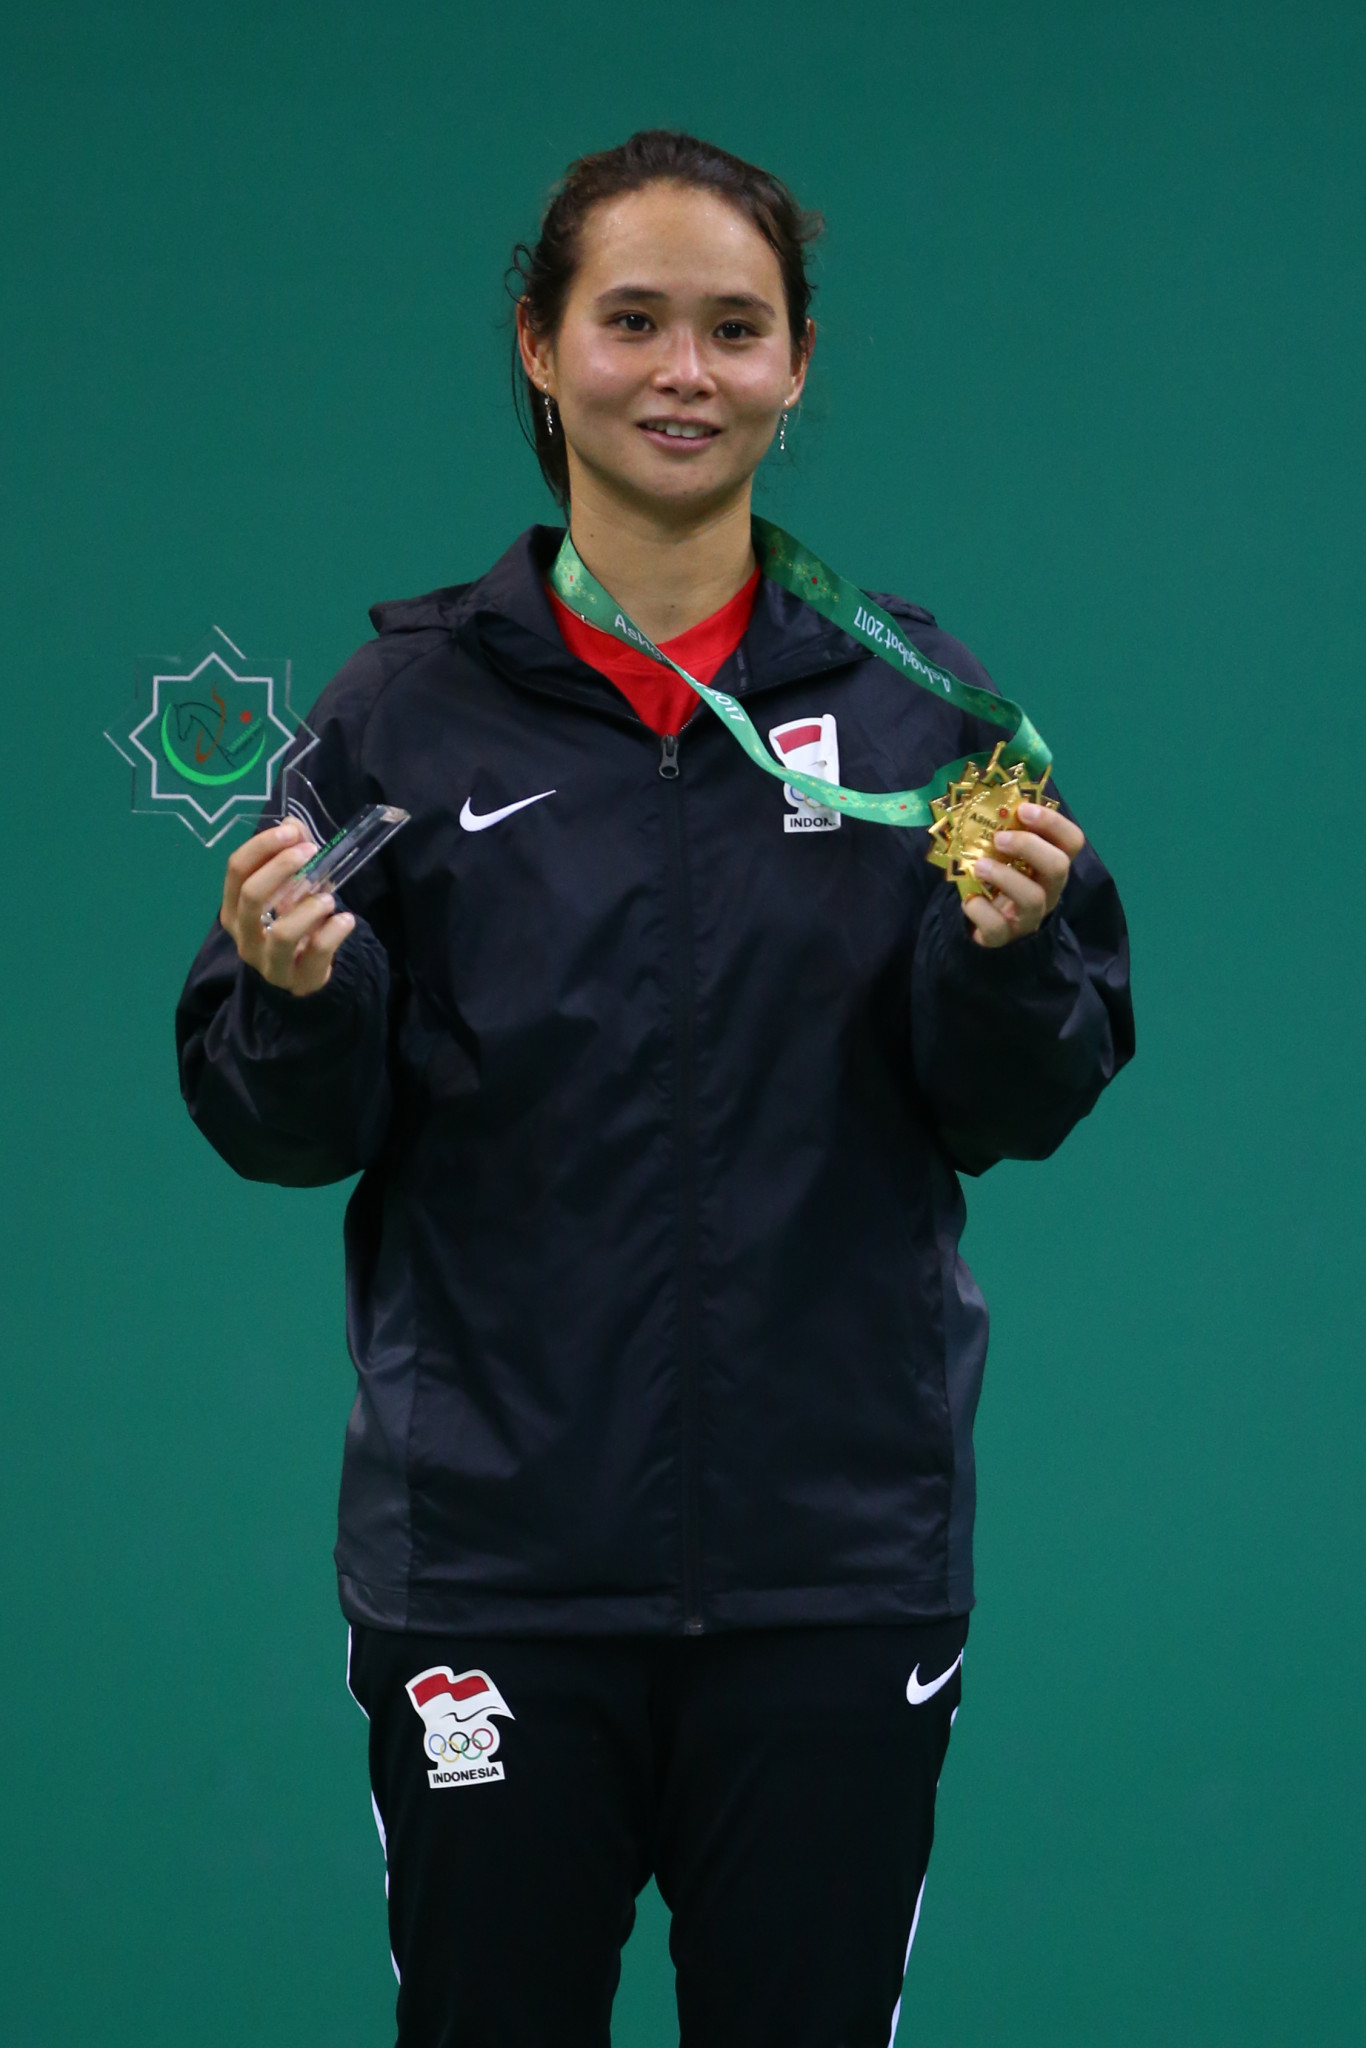 Gumulya wins all-Indonesian women's singles indoor tennis final on day 11 of Ashgabat 2017